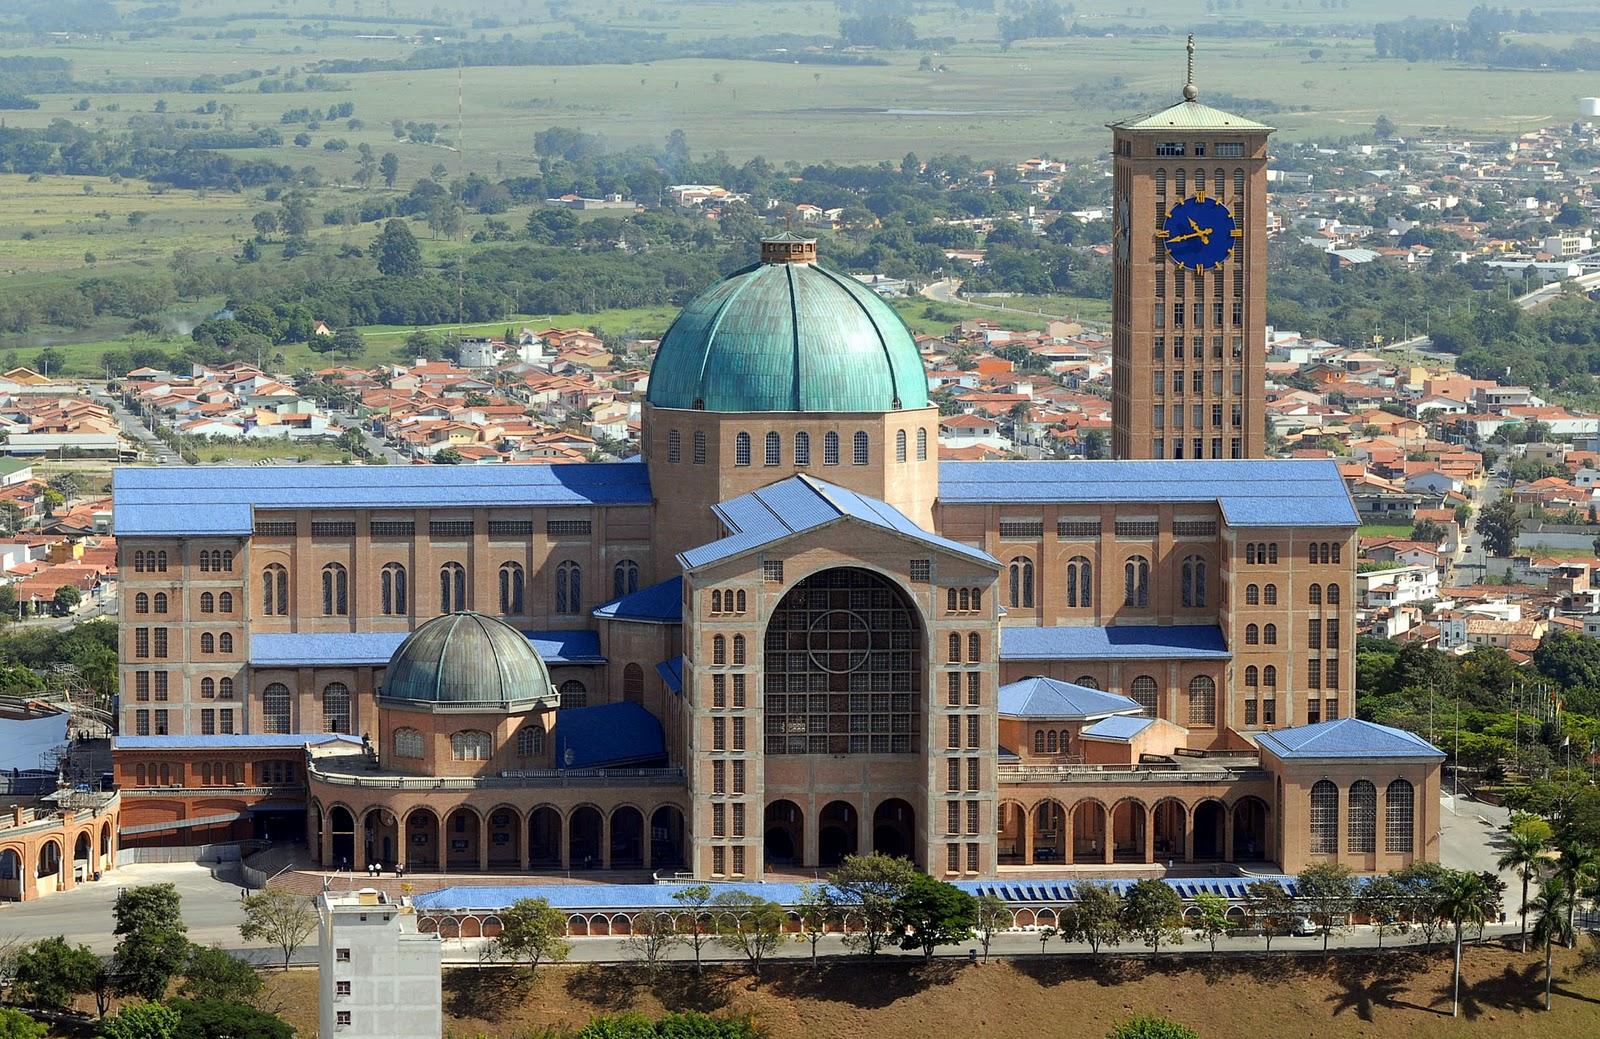 Aparecida 2019 Best Of Aparecida Brazil Tourism: Top 10 Largest Churches Of The World